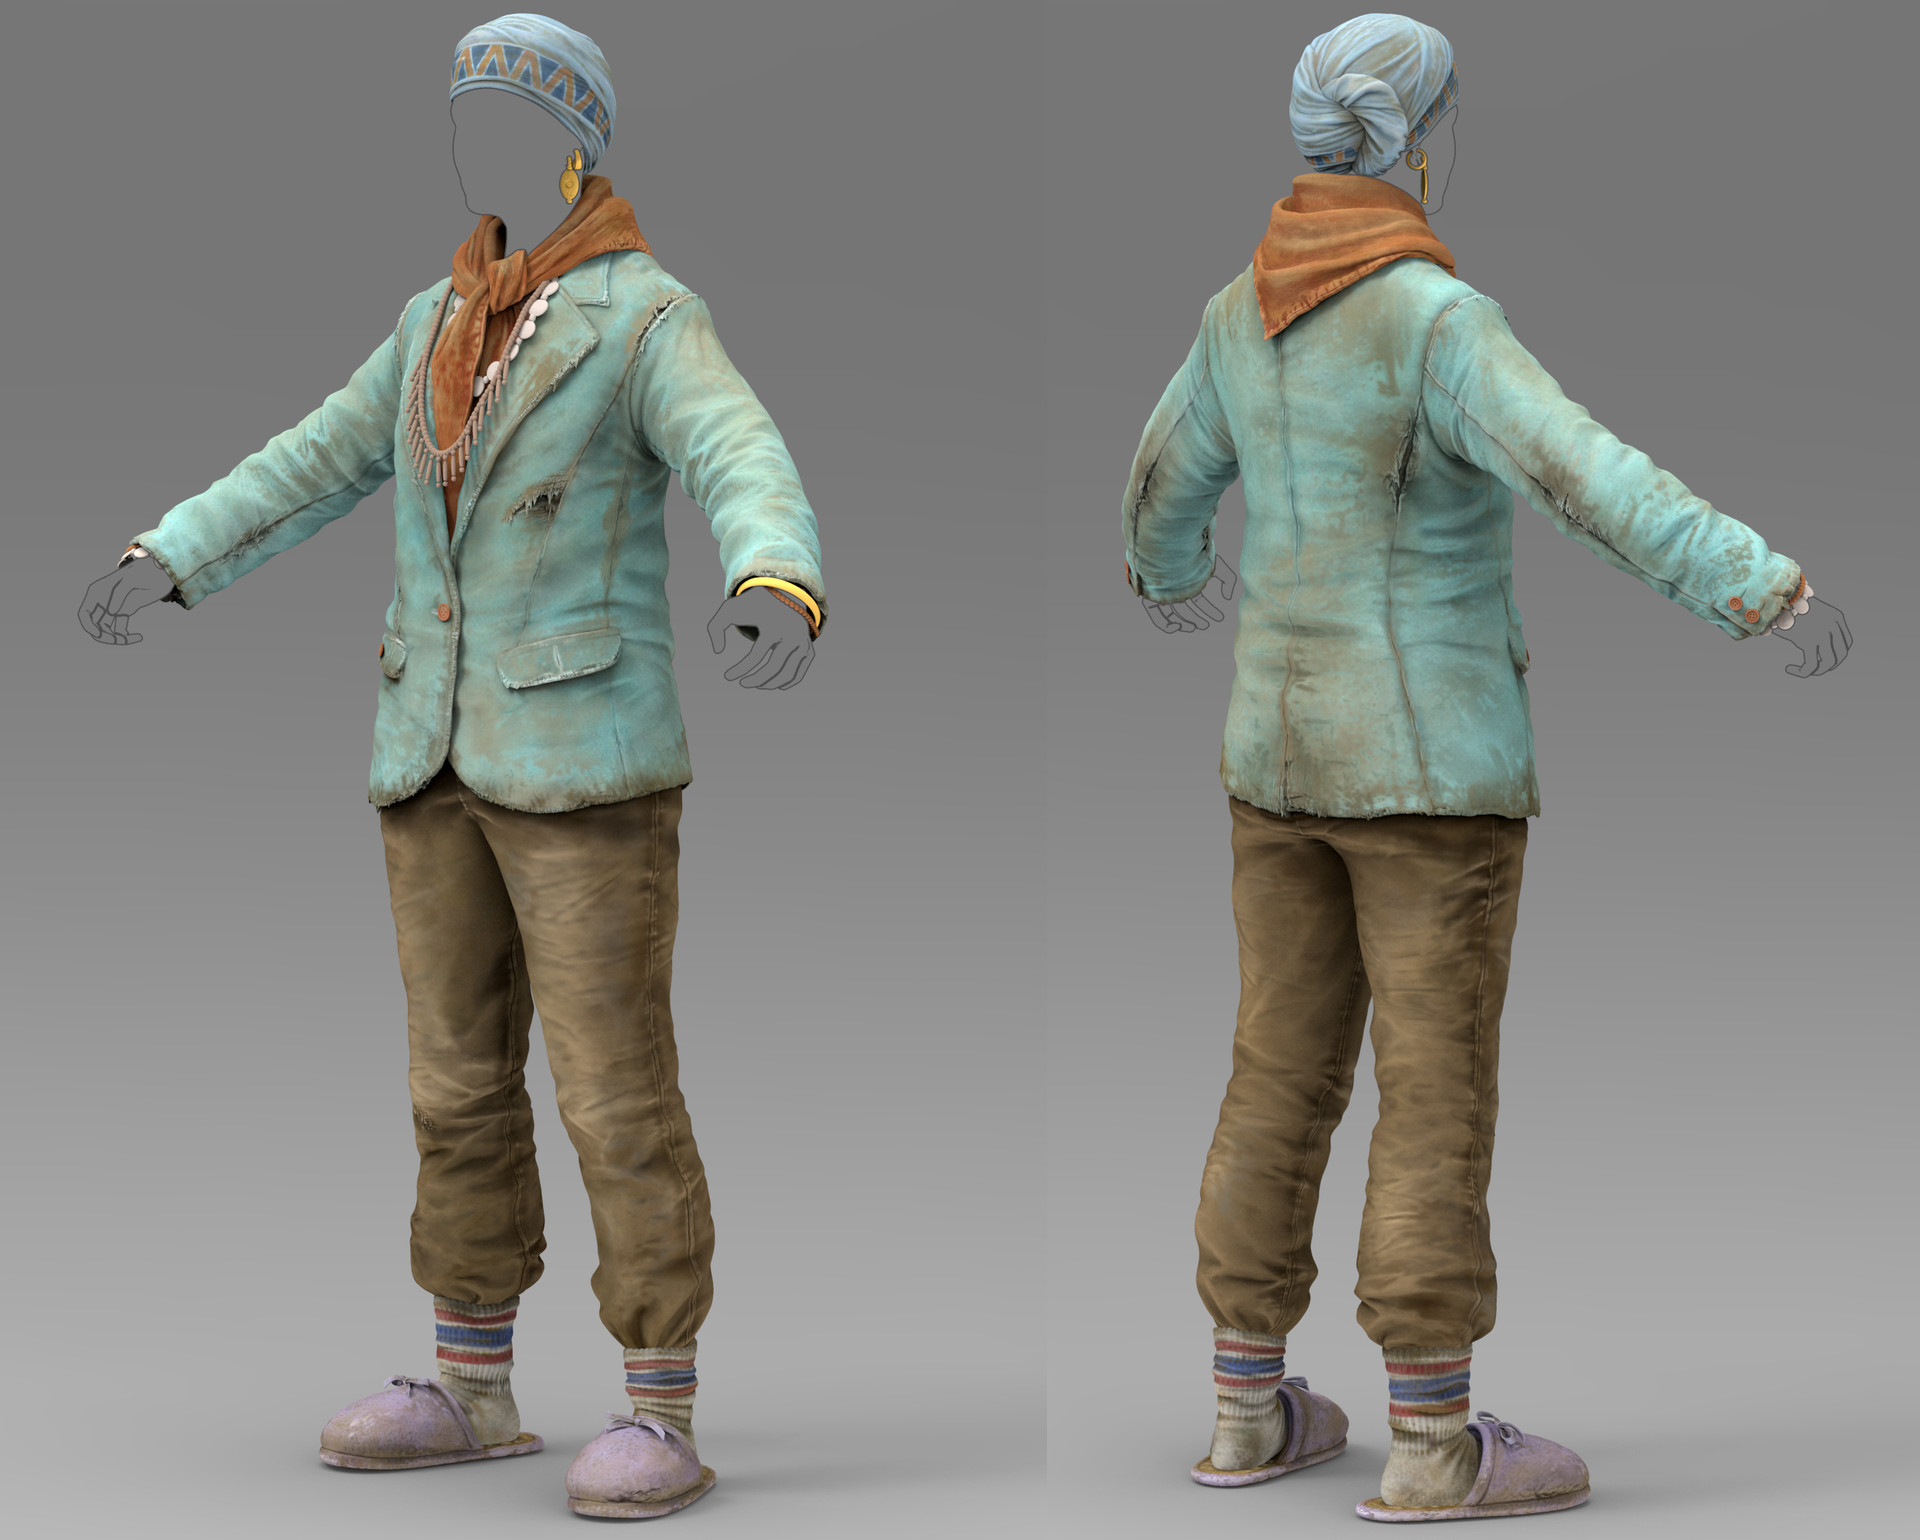 ArtStation - Fallout 4 Mama Murphy Outfit, Charles Kim